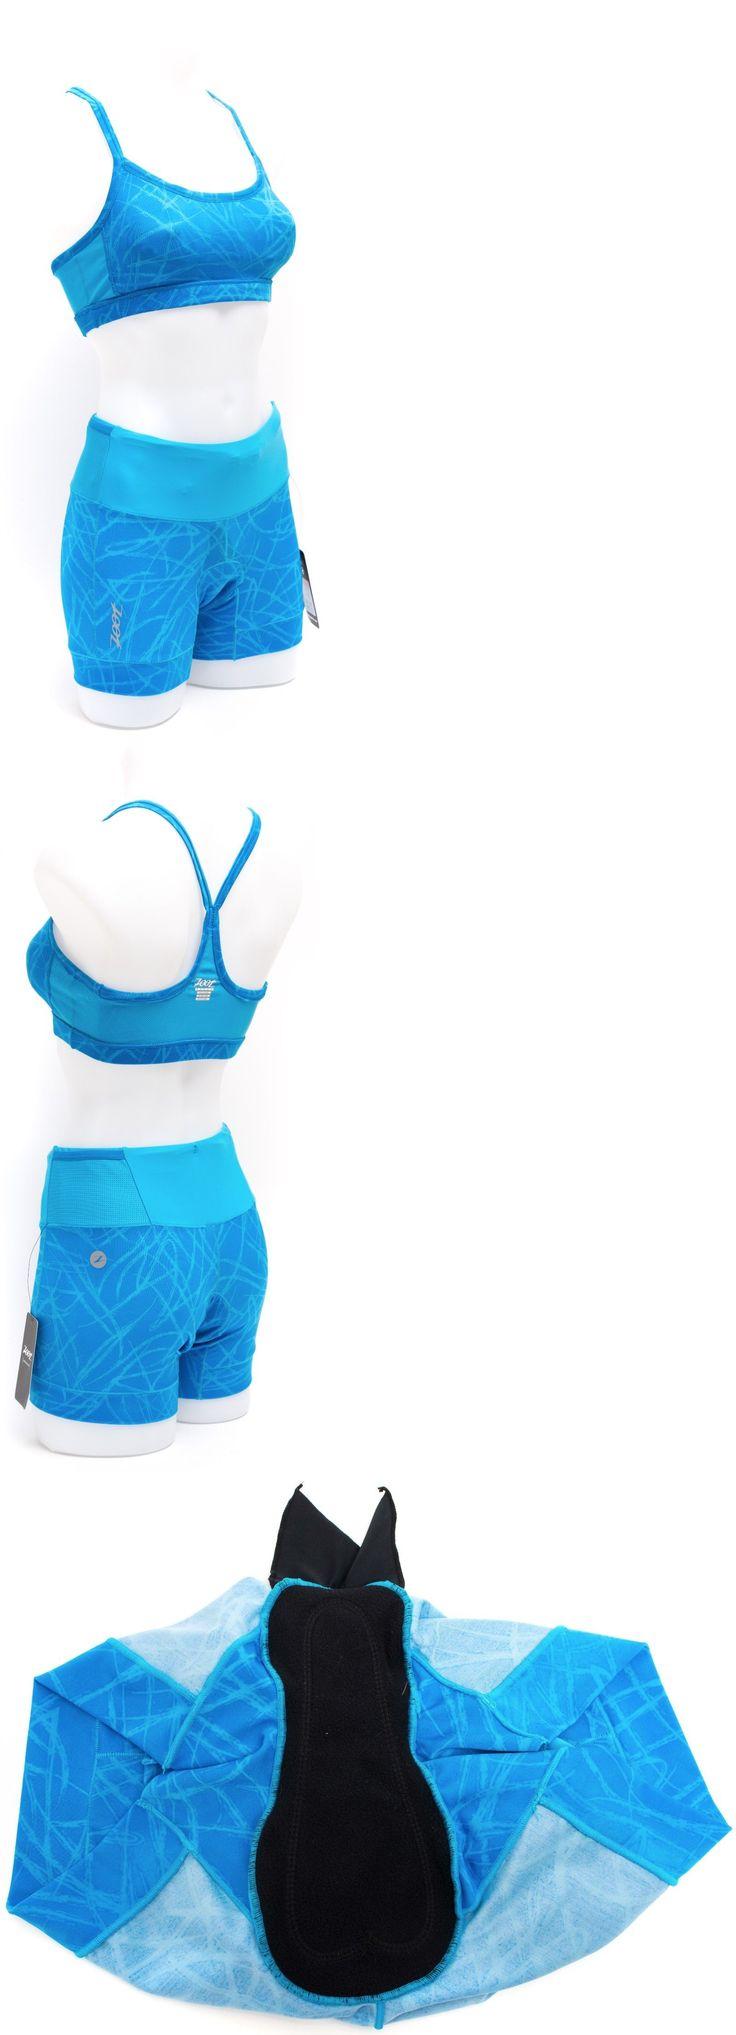 Triathlon 2918: Zoot Women Performance Tri Top + Performance Tri 4 Medium Shorts Mali Blue New -> BUY IT NOW ONLY: $39.95 on eBay!